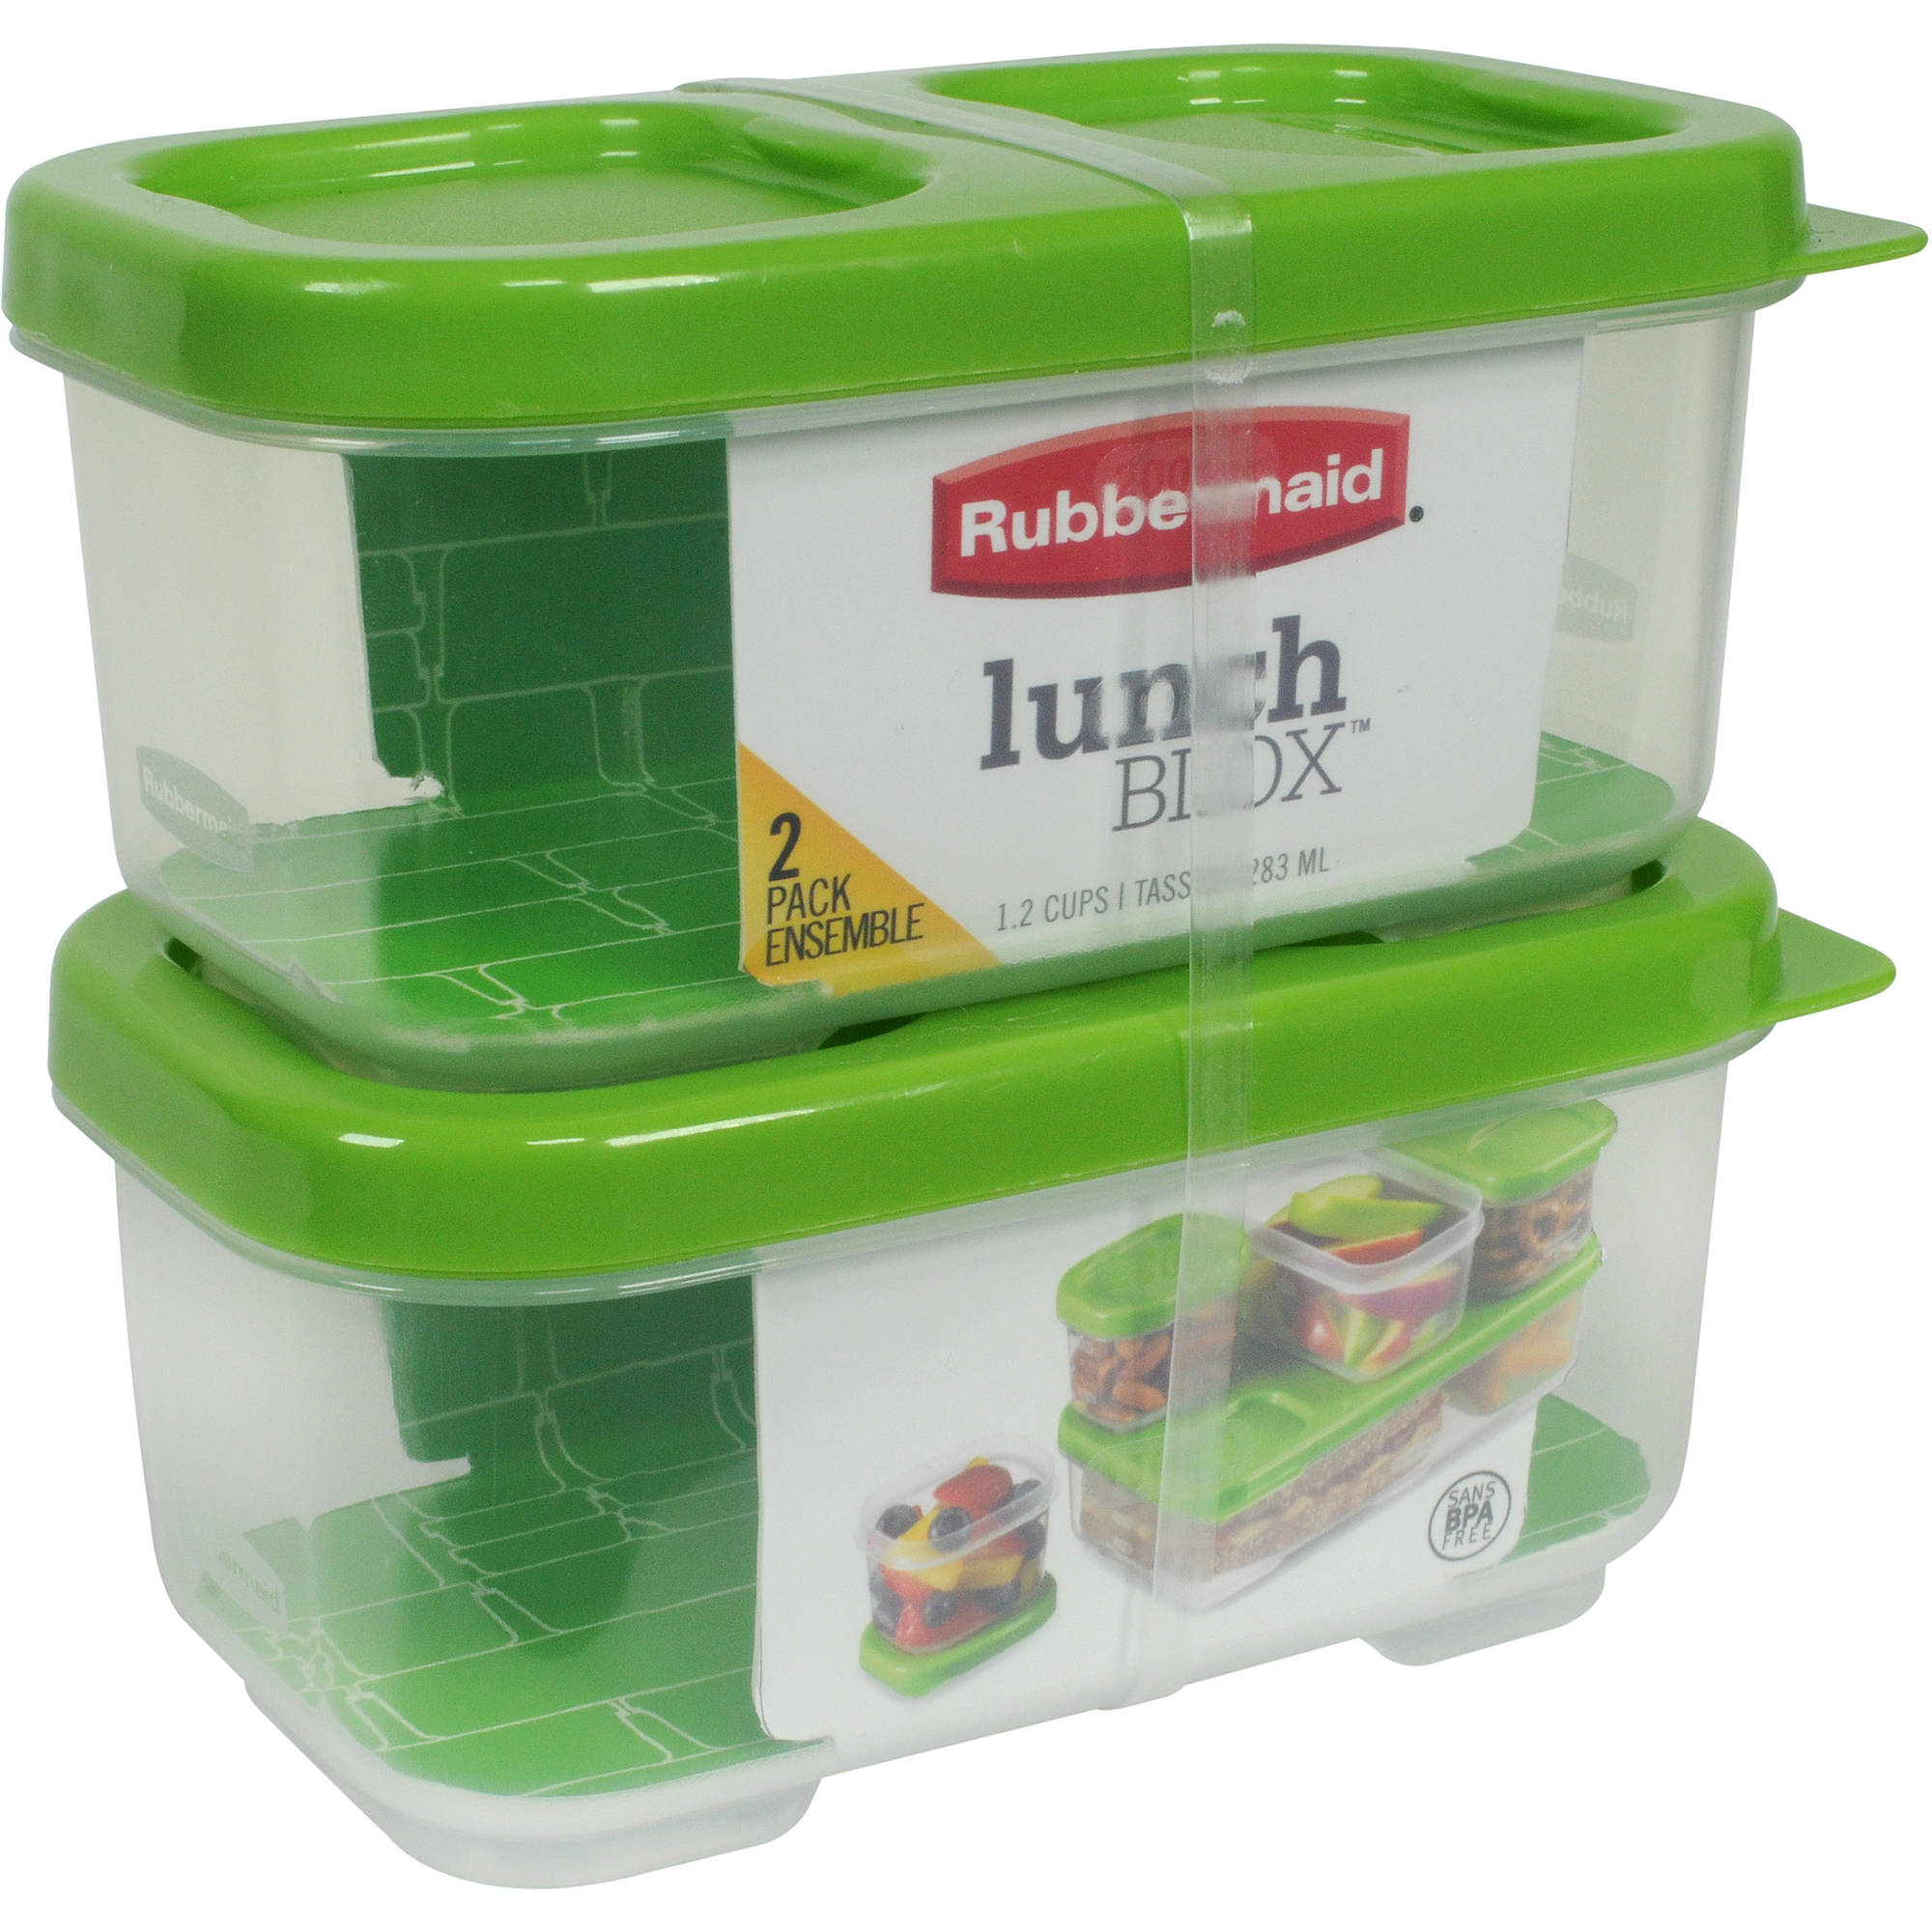 rubbermaid storage containers WalMart Wishmindr Wish List App